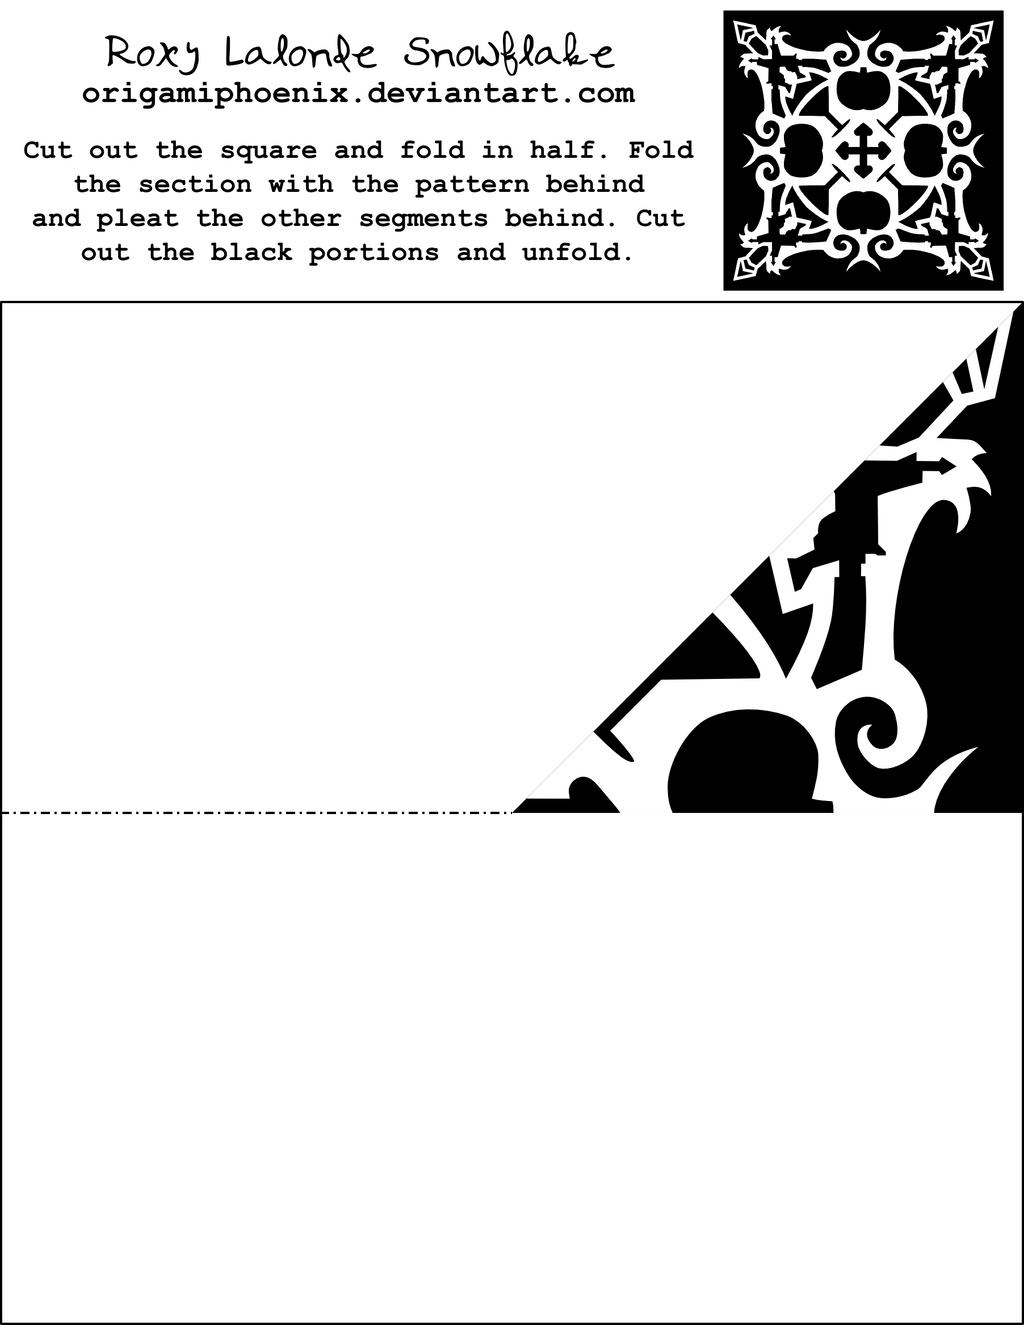 Roxy Lalonde Snowflake Printout by OrigamiPhoenix on DeviantArt